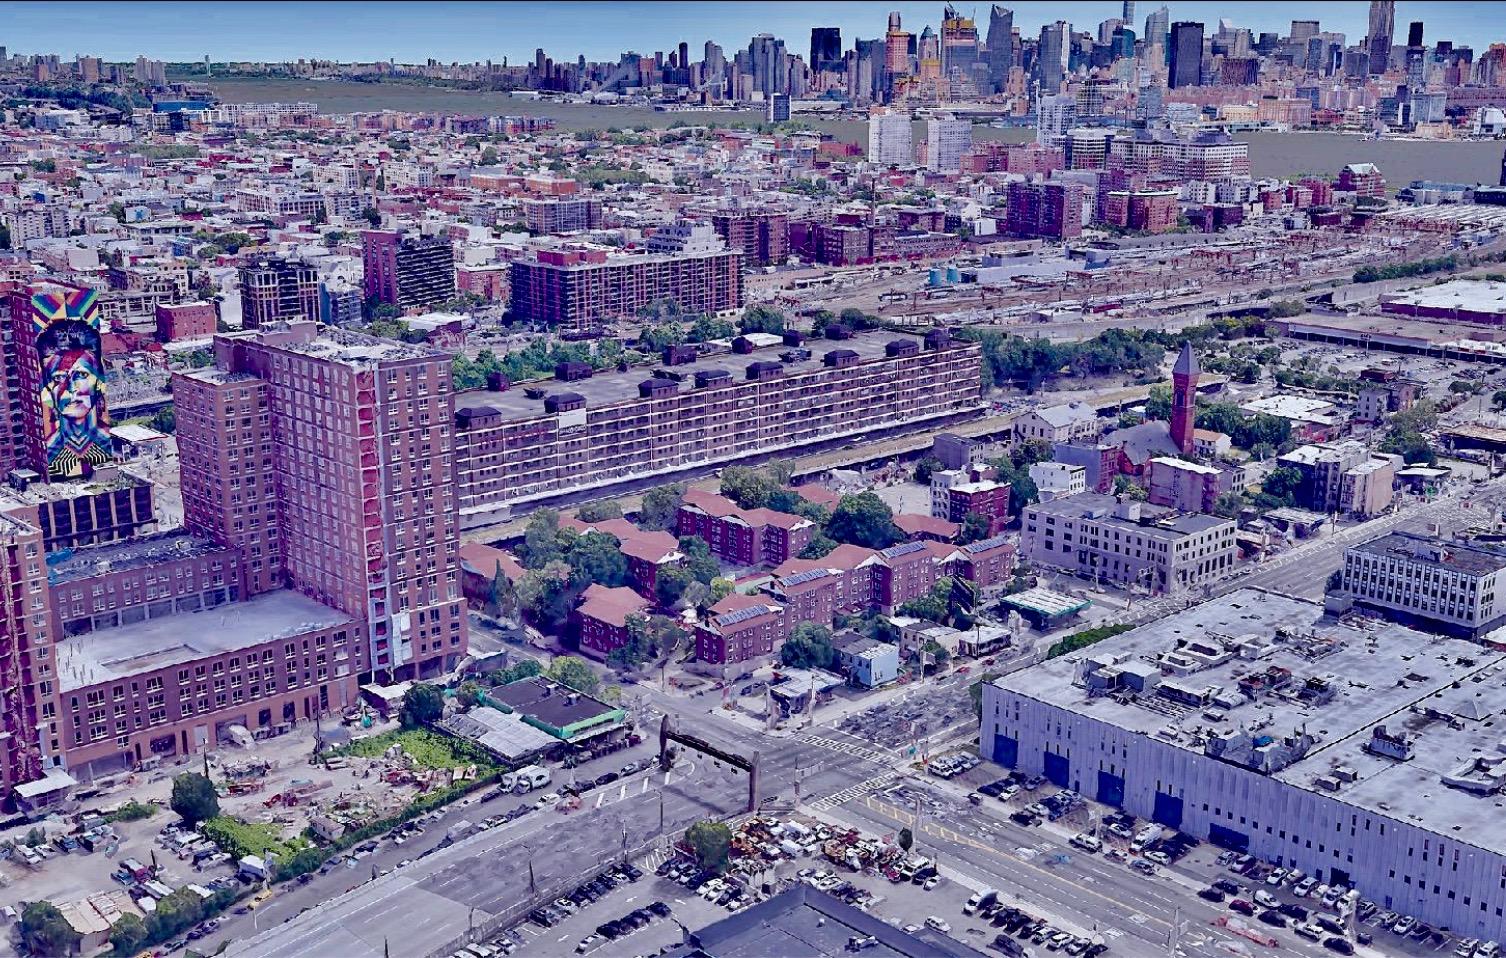 Holland Gardens Housing to be Razed, Reimagined